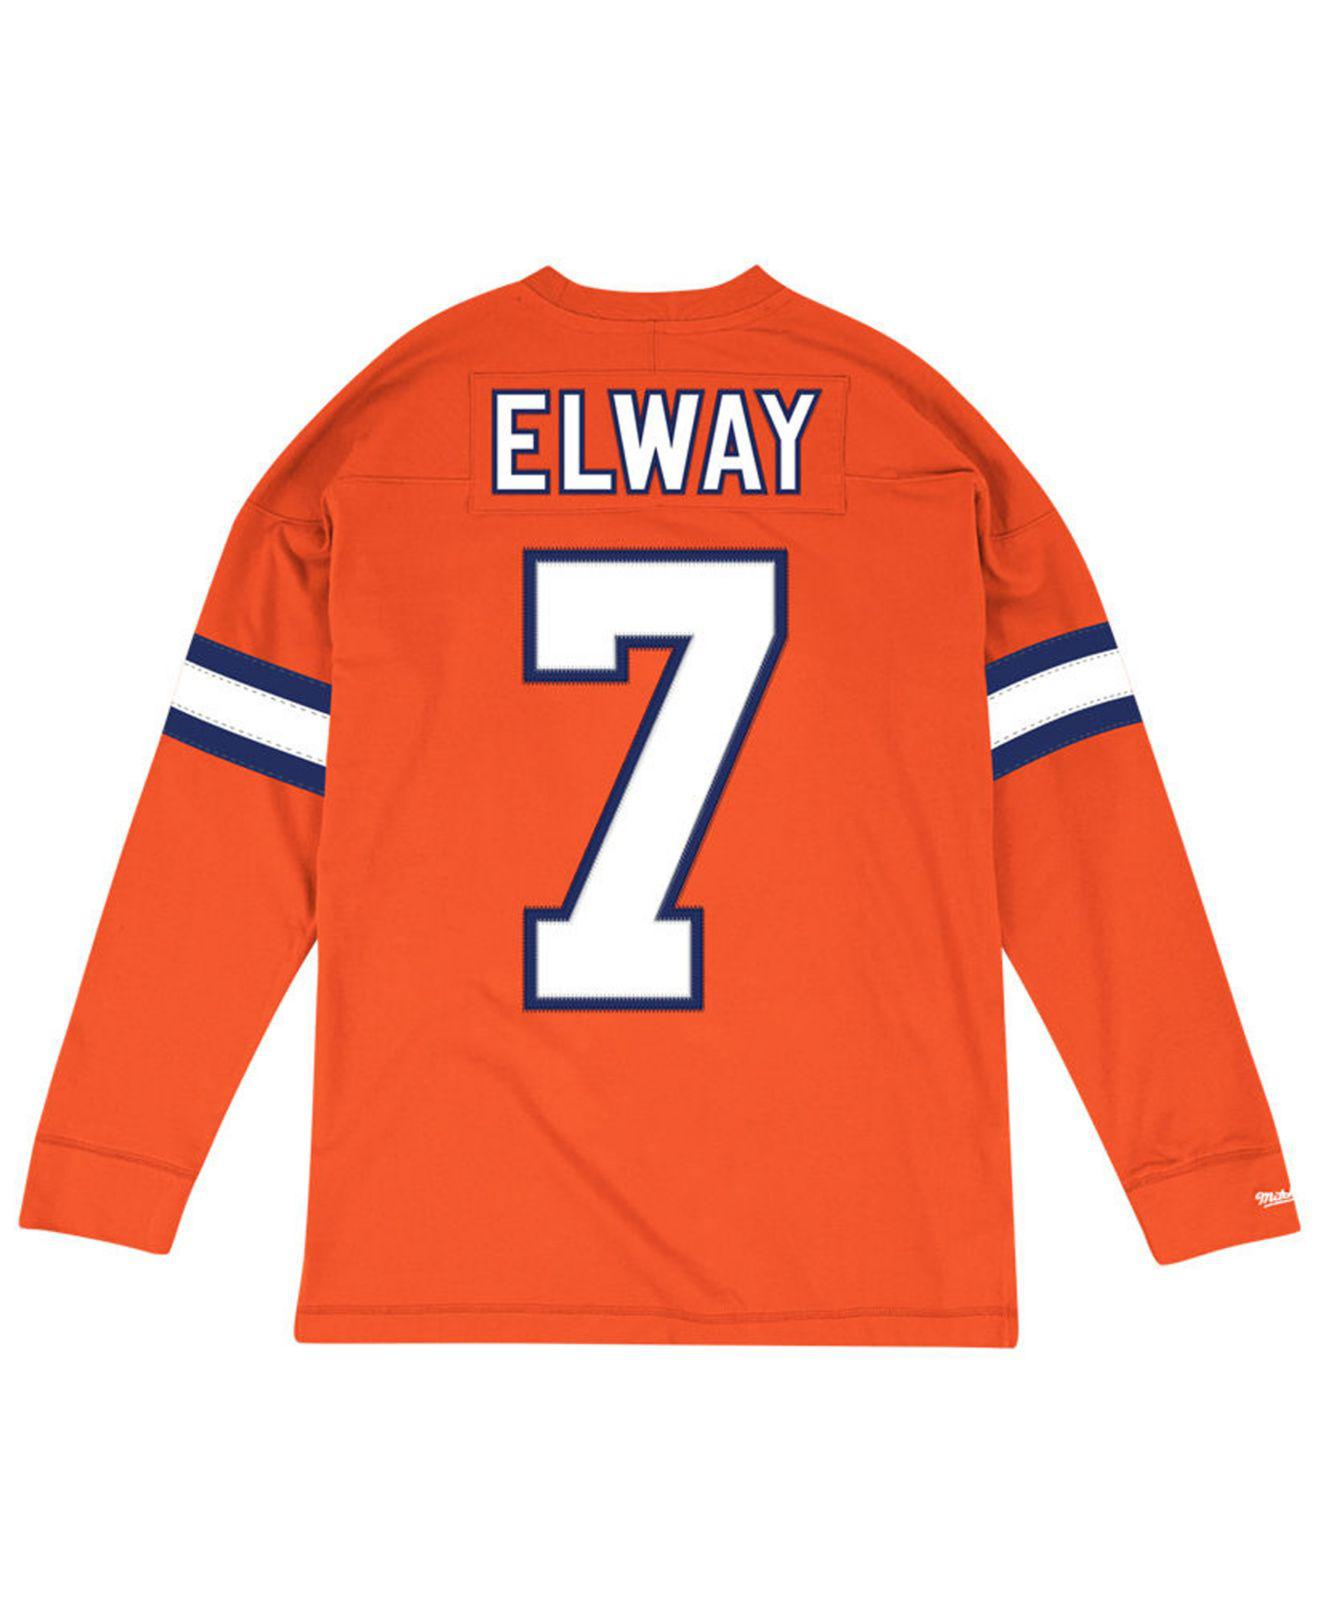 buy online 4eeba 833c6 Orange Men's Retro Player Name & Numer Longsleeve T-shirt